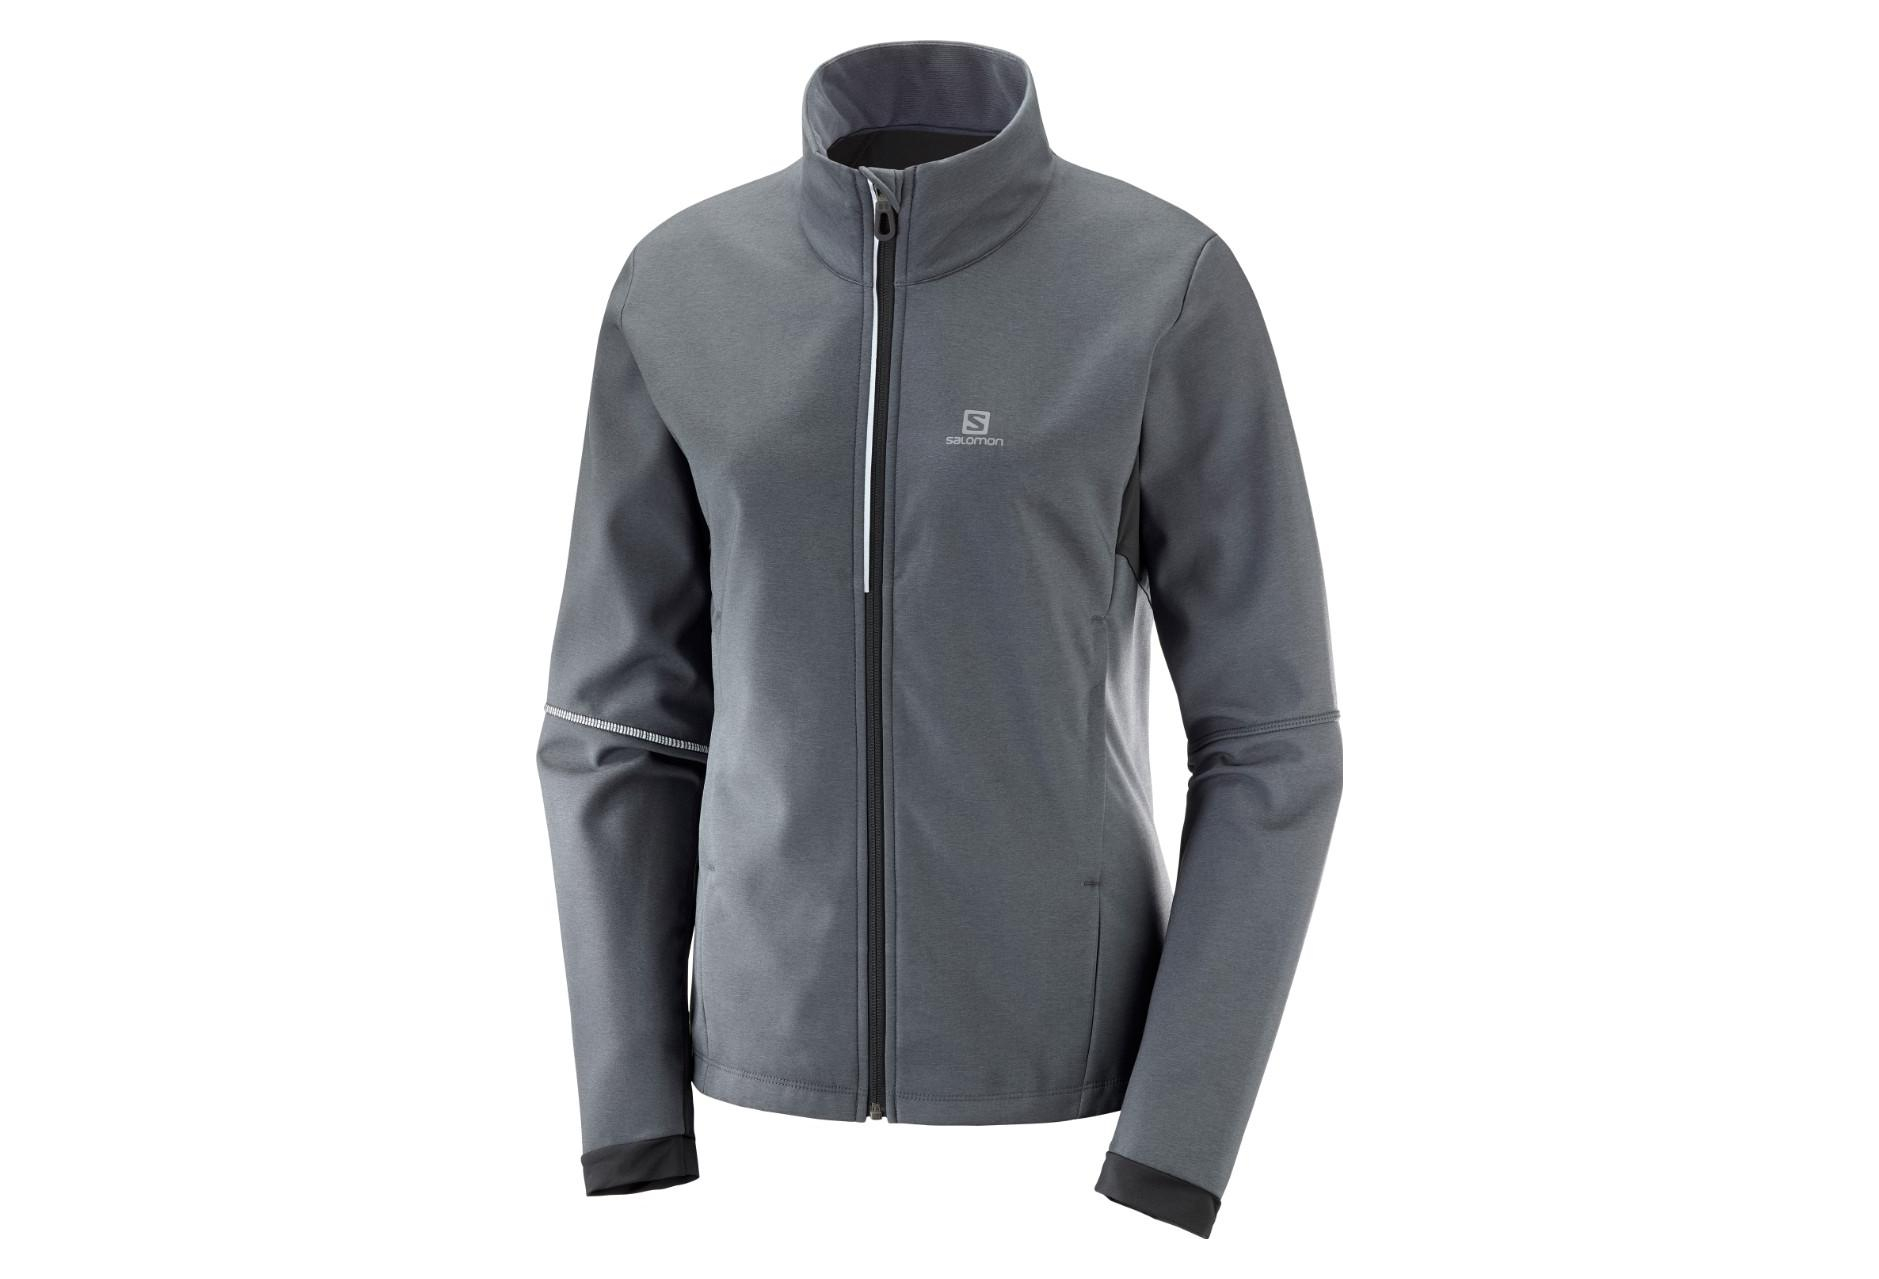 huge selection of 11d0c 2123c Salomon Jacket Softshell Agile Grey Women